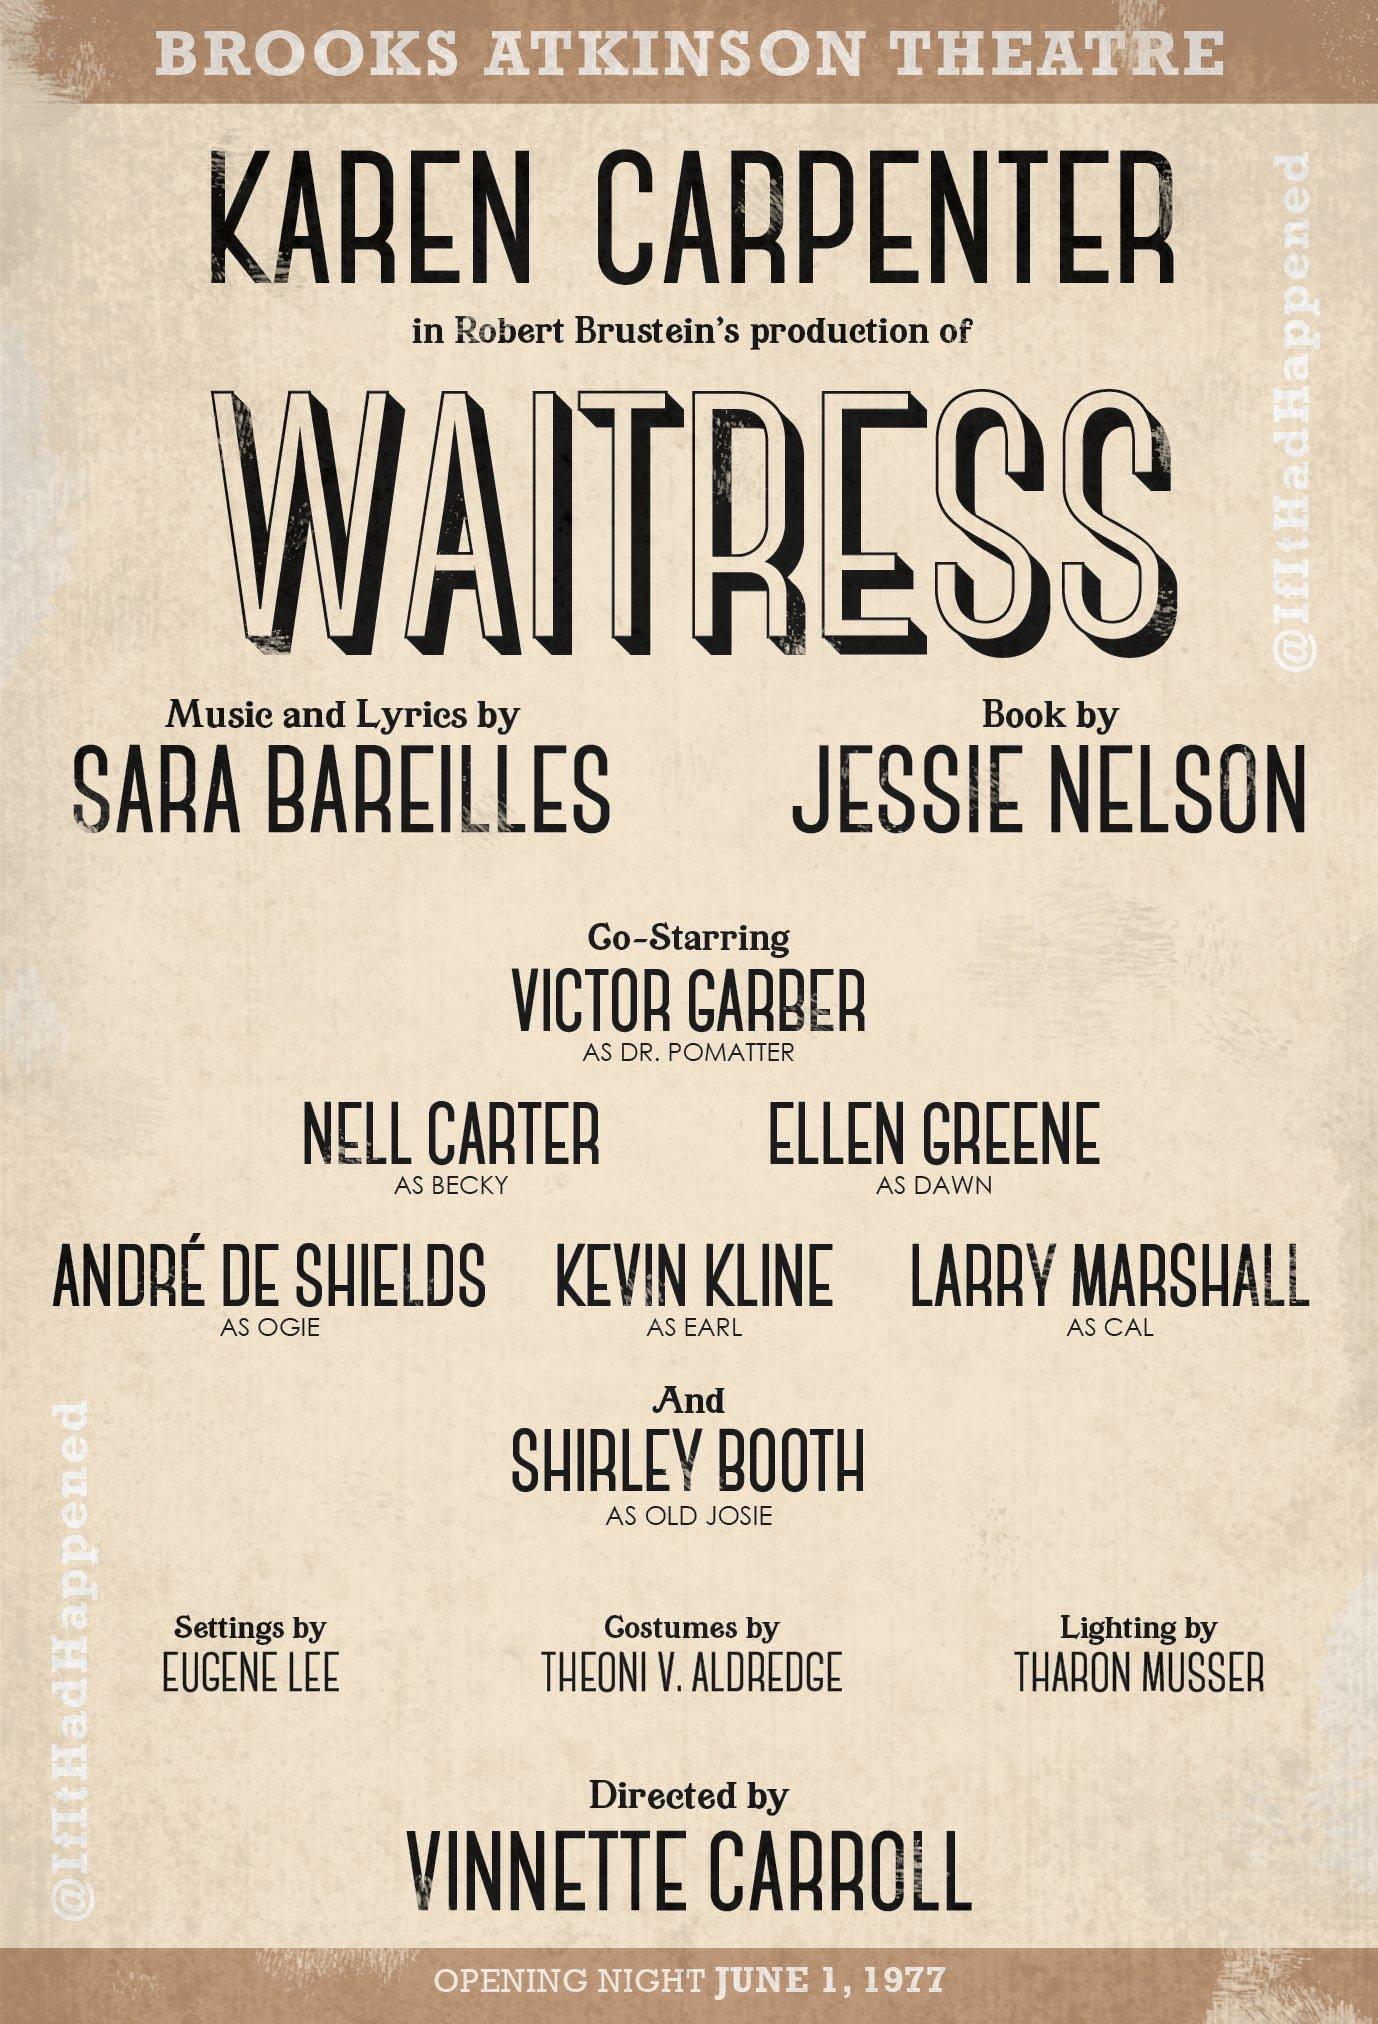 Upcoming Waitress casting